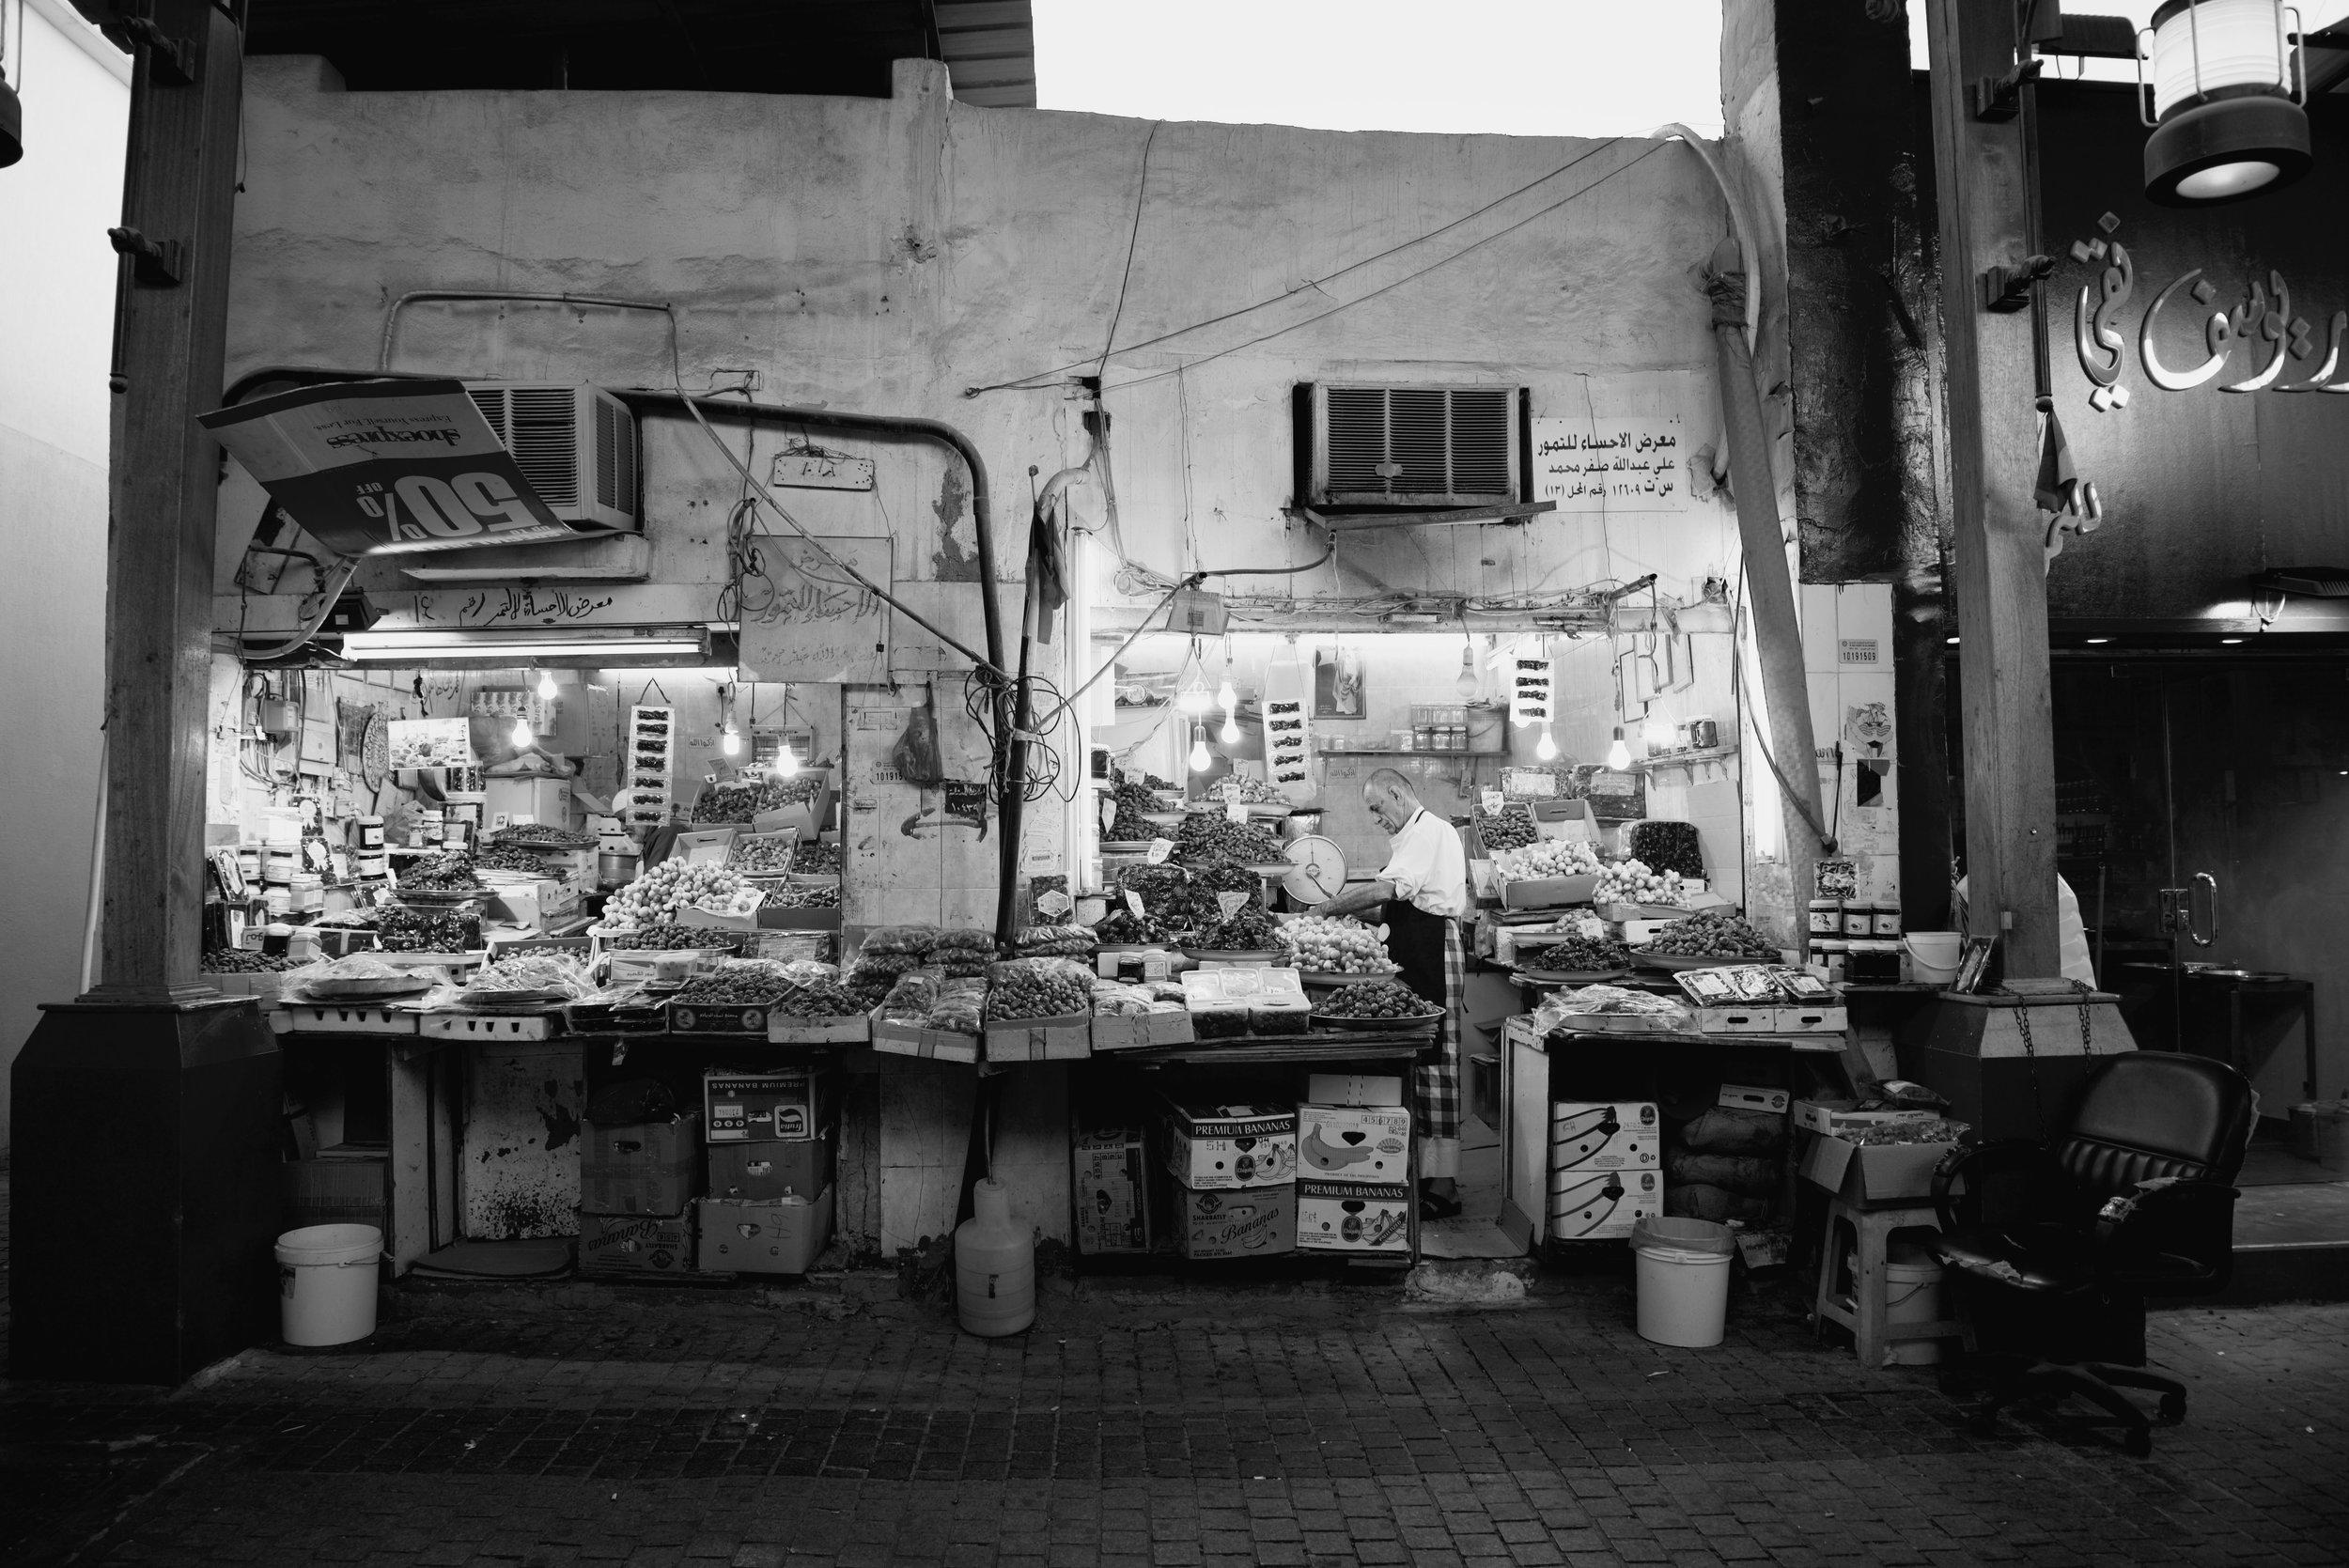 Mubarakiya old market, Al Kuwayt, Kuwait